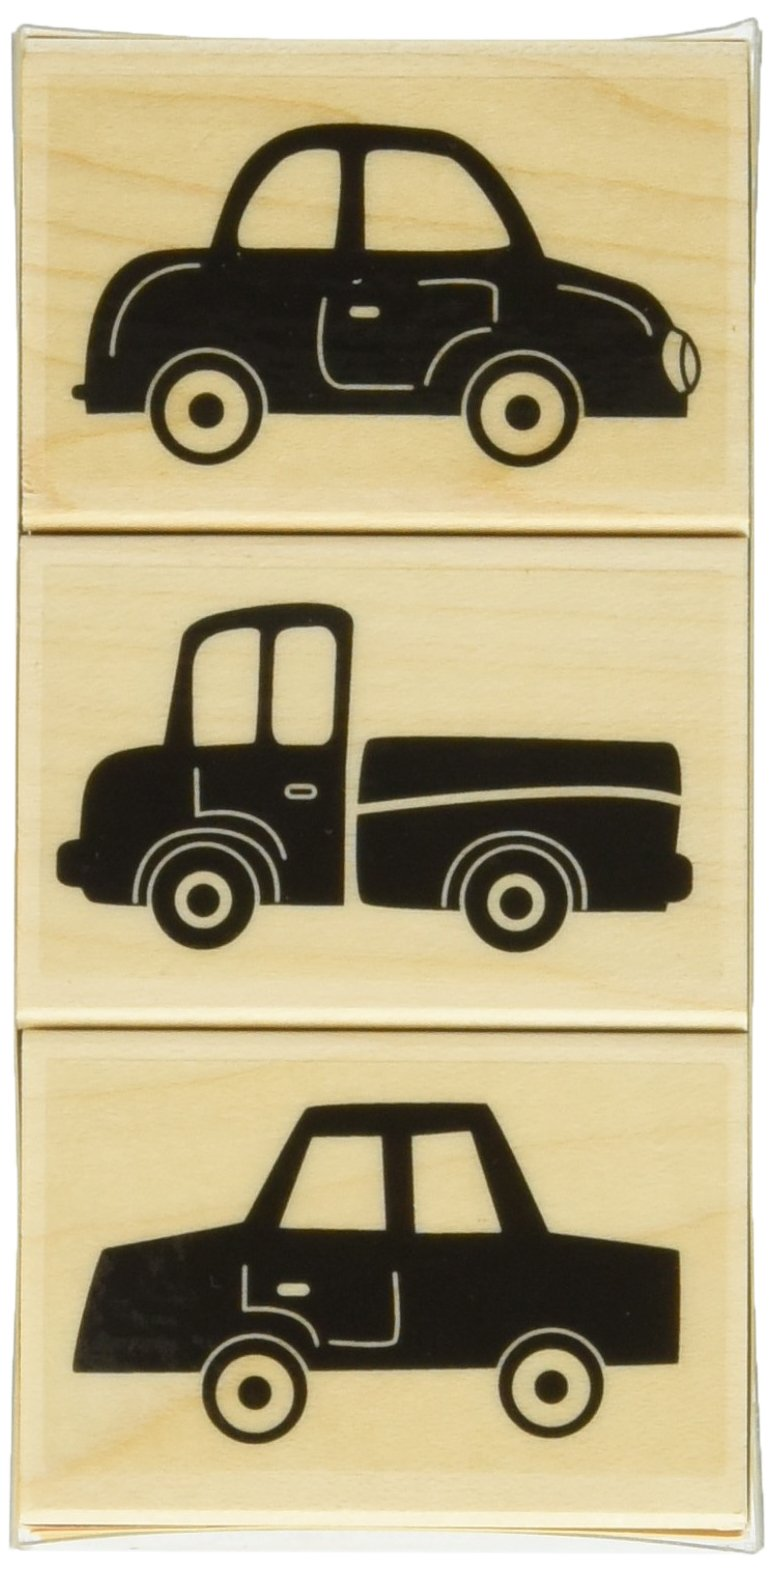 Hero Arts Three Fun Cars Woodblock Stamp Set